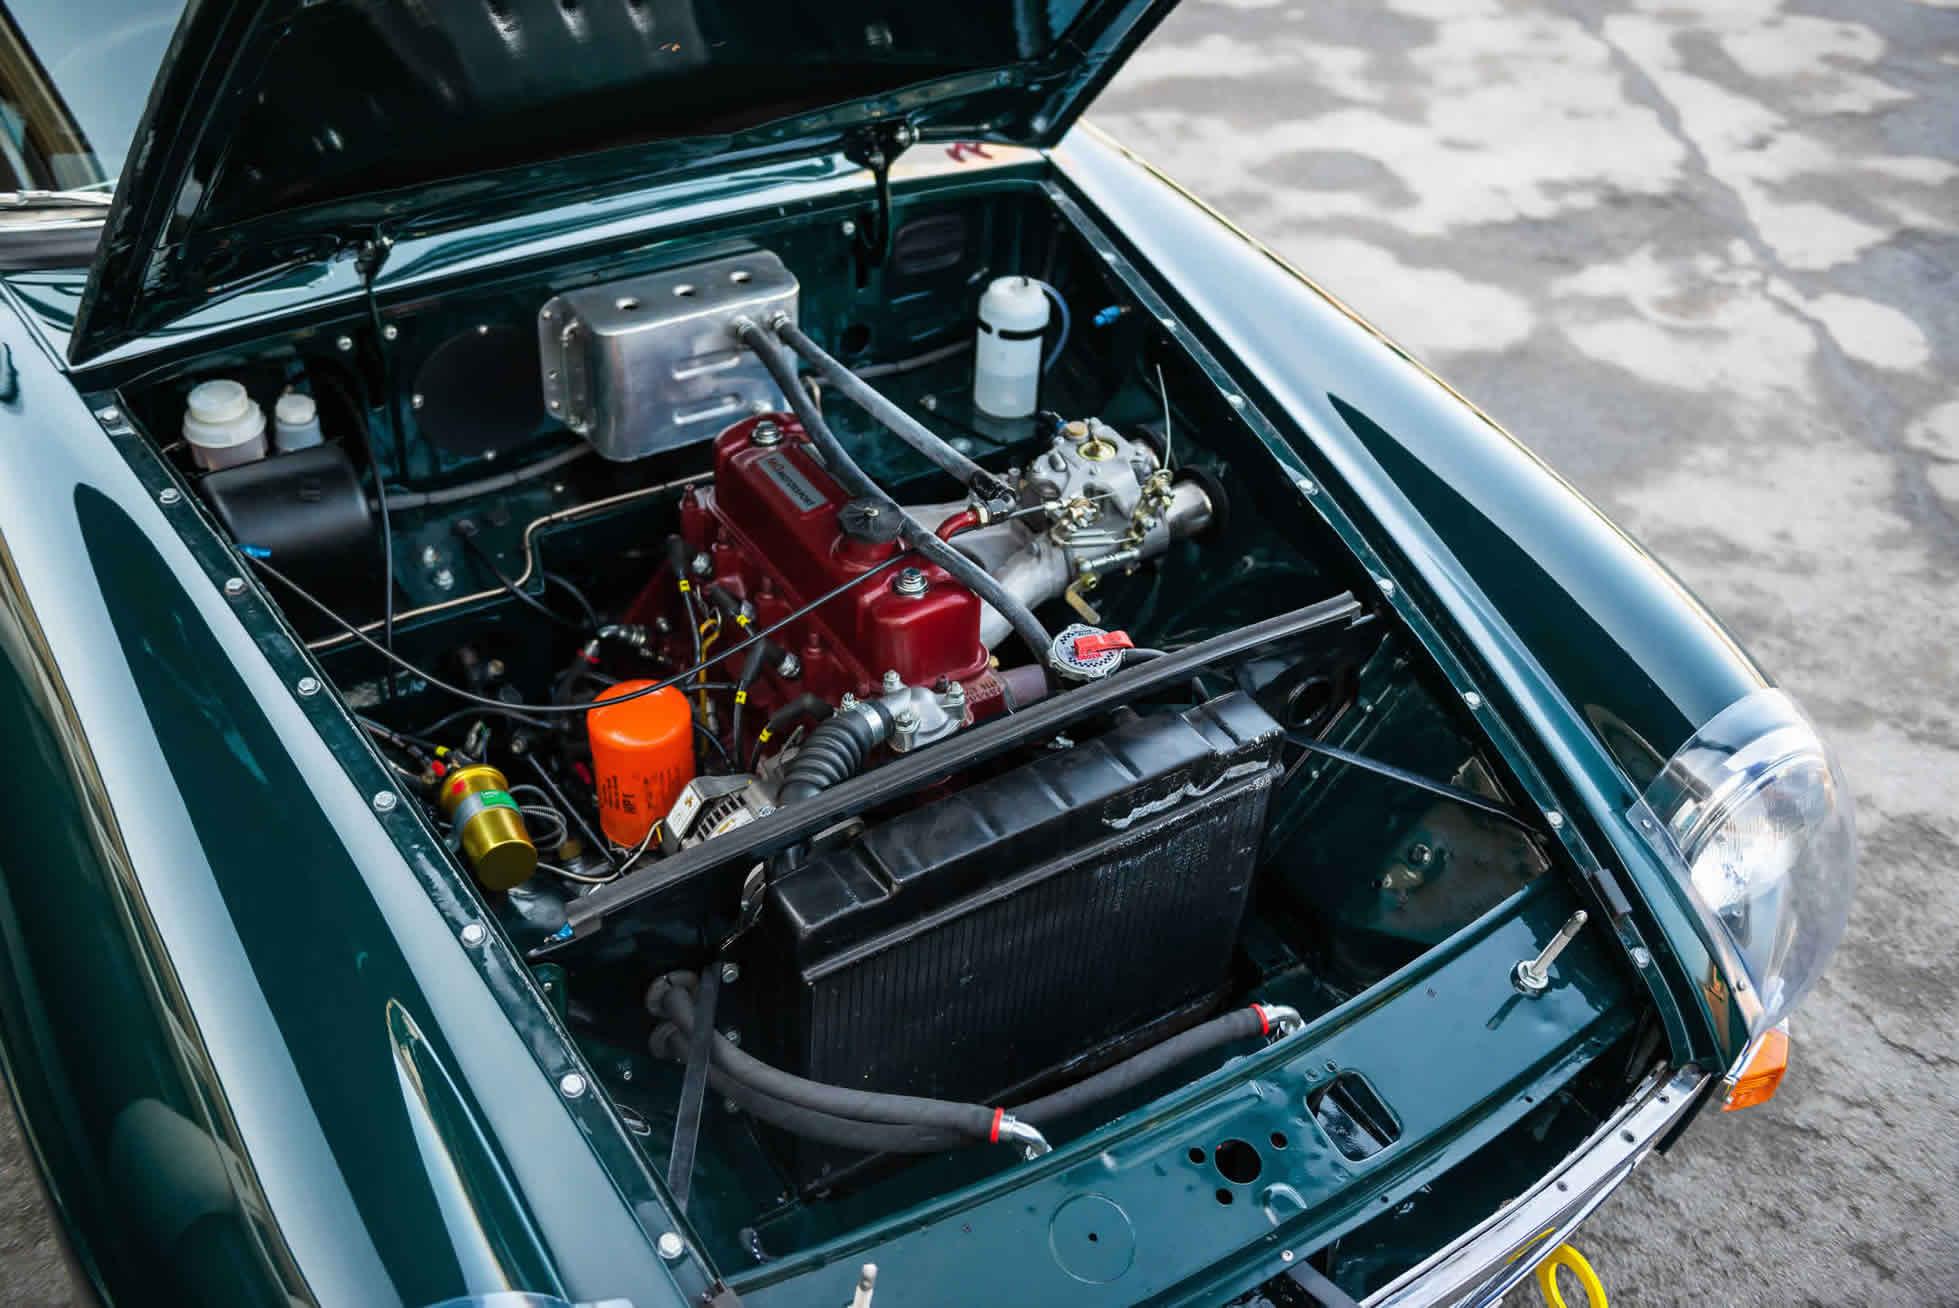 For Sale 1964 MGB Roadster FIA Race Car engine